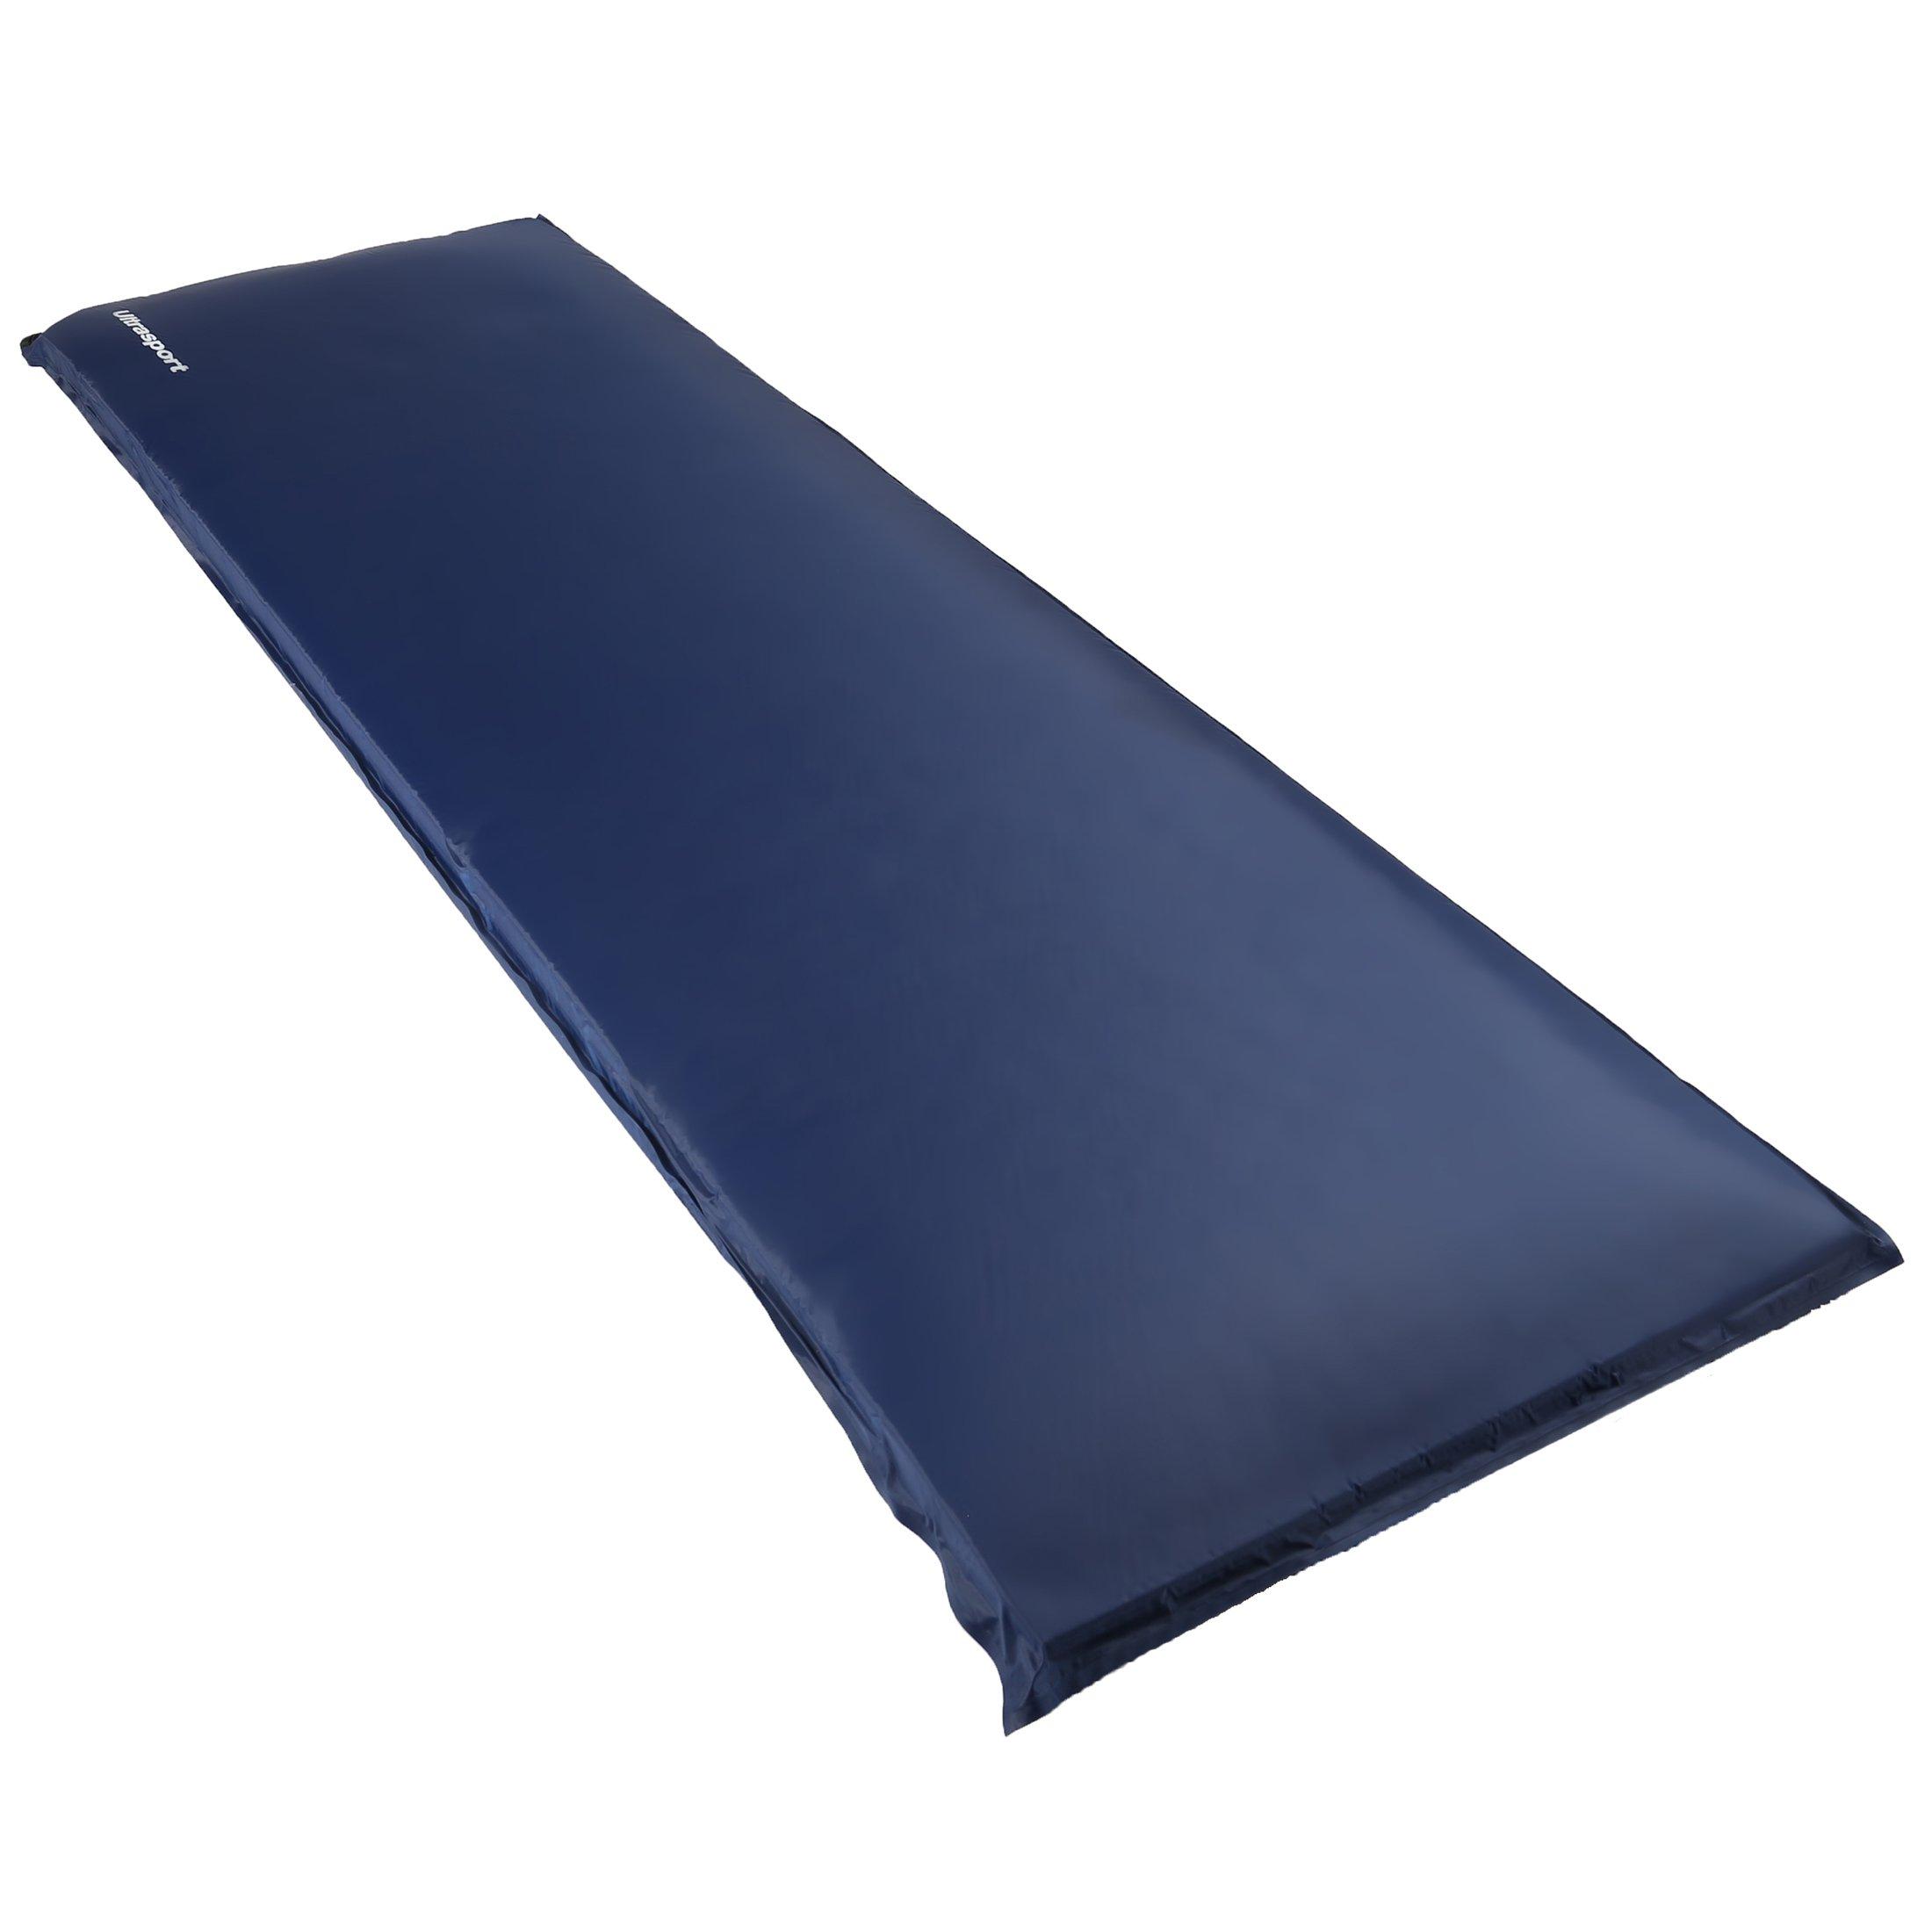 Ultrasport Aislante autoinflable / colchoneta autoinflable, ideal para el camping, colchoneta para el exterior, ultraligera y cómoda; impermeable, colchoneta térmica en 3 grosores, plegada ocupa muy poco espacio